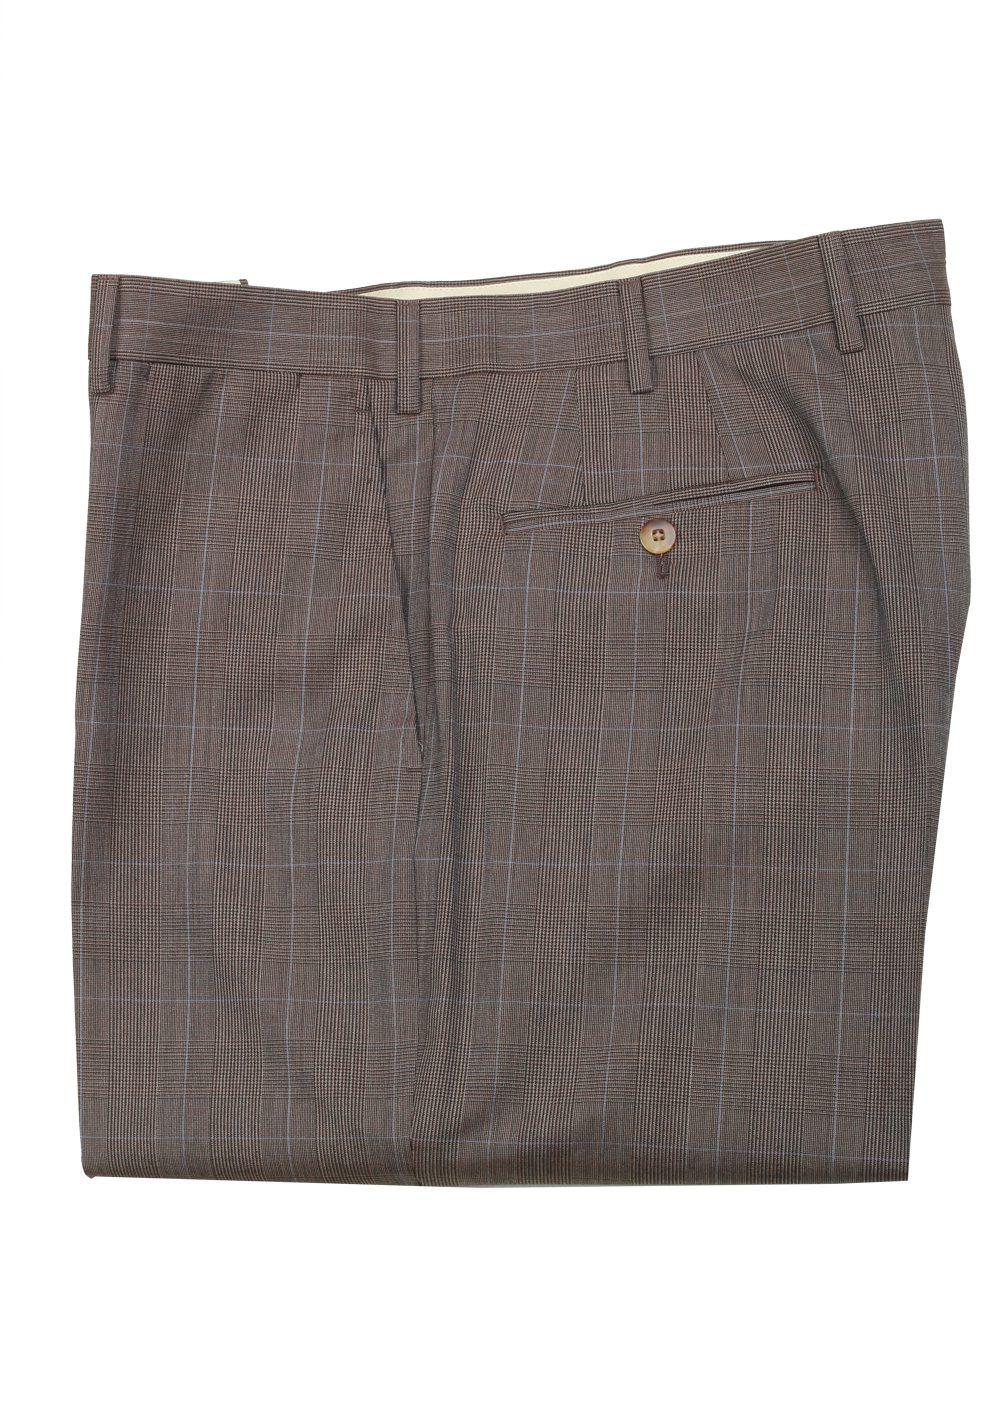 Caruso Gray Checked Trousers Size 56 / 40 U.S. | Costume Limité